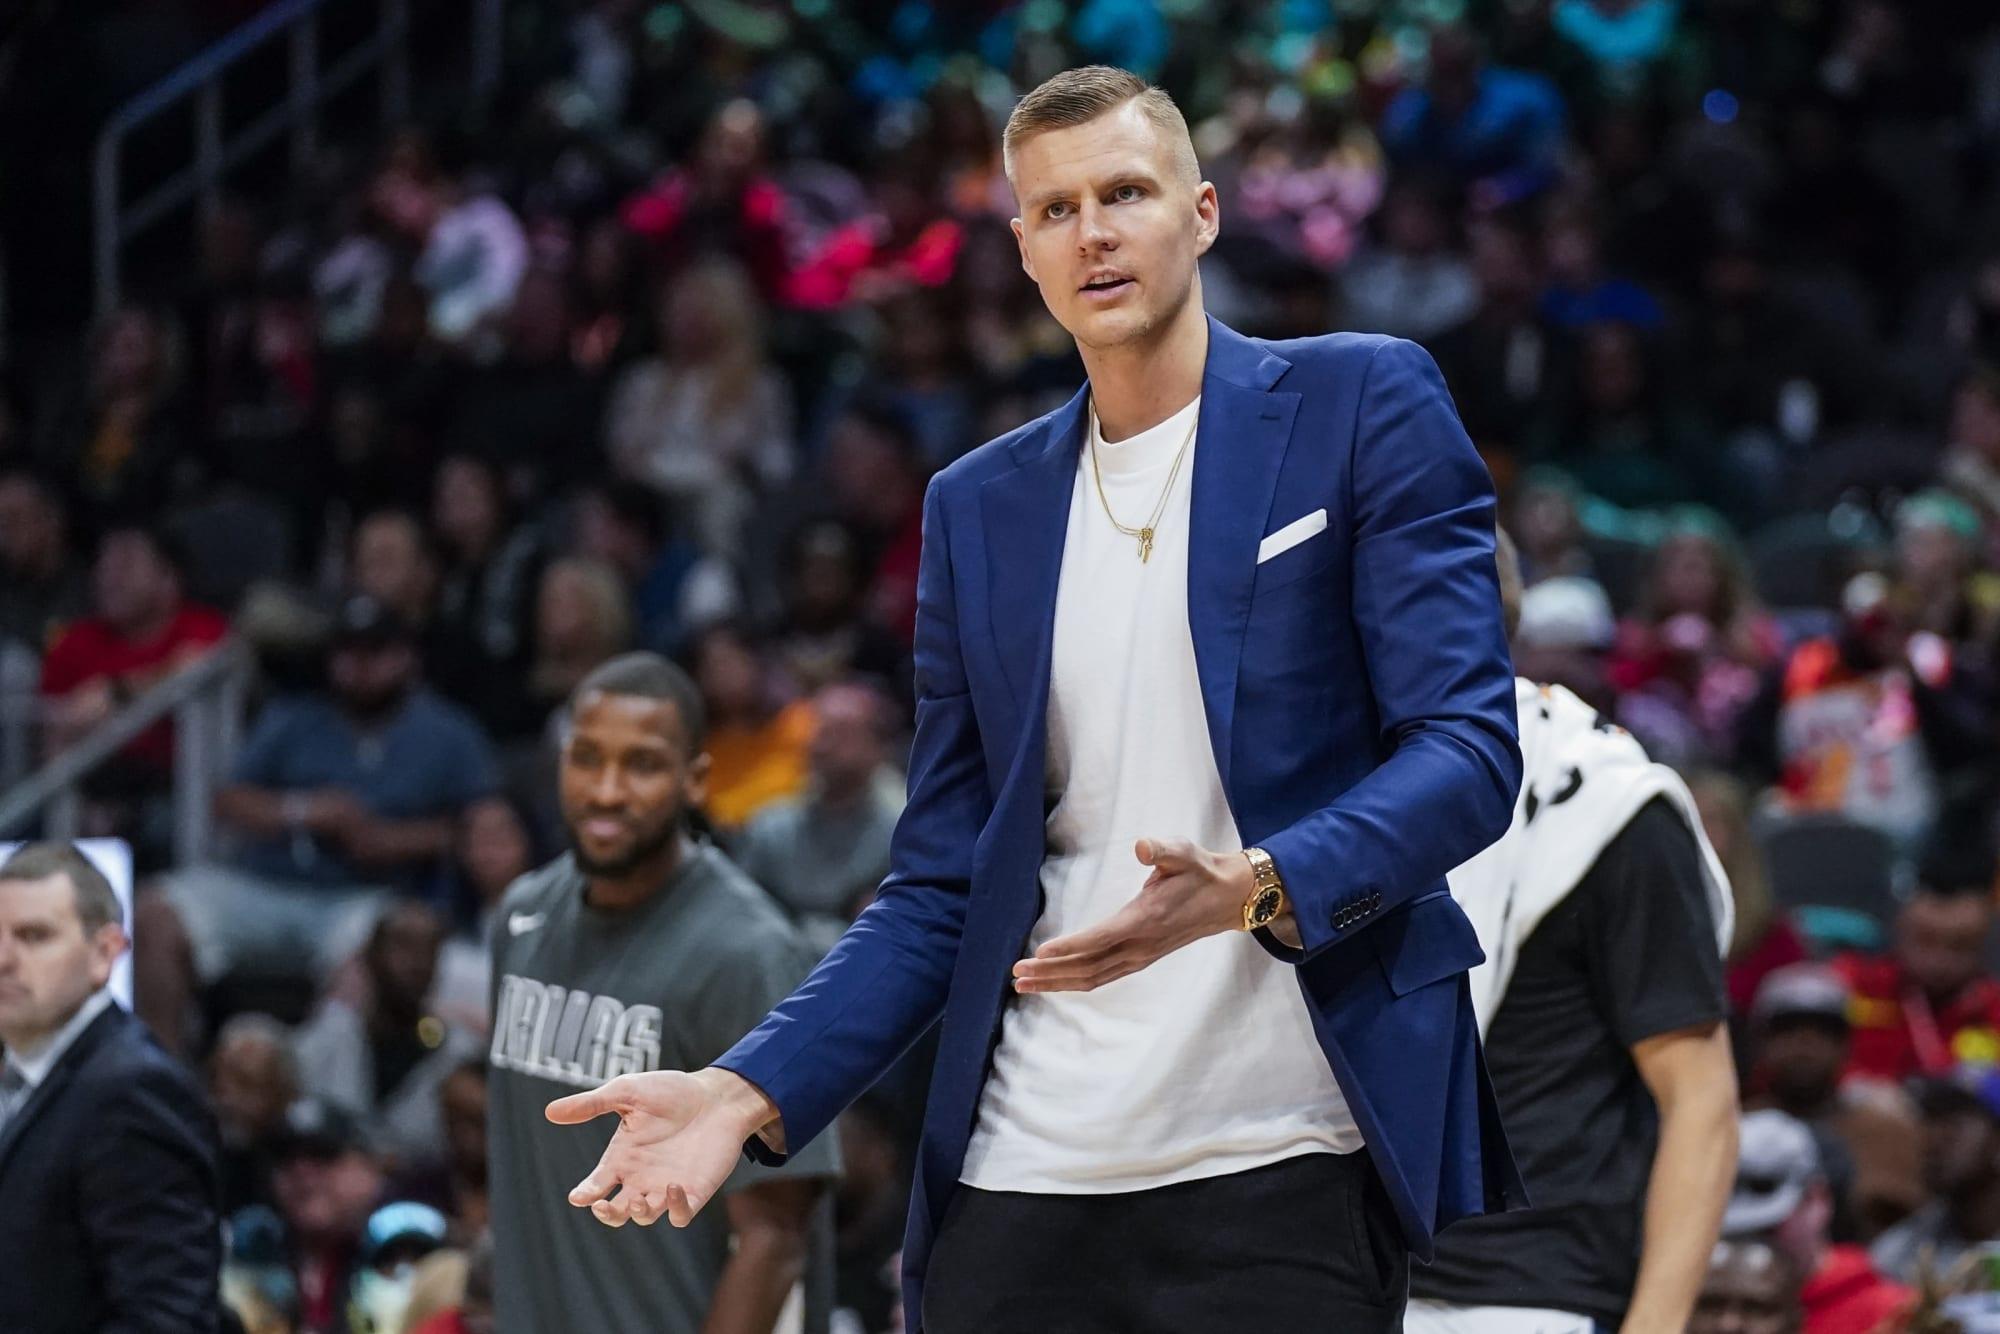 Dallas Mavericks cannot wait to get Kristaps Porzingis back on the court